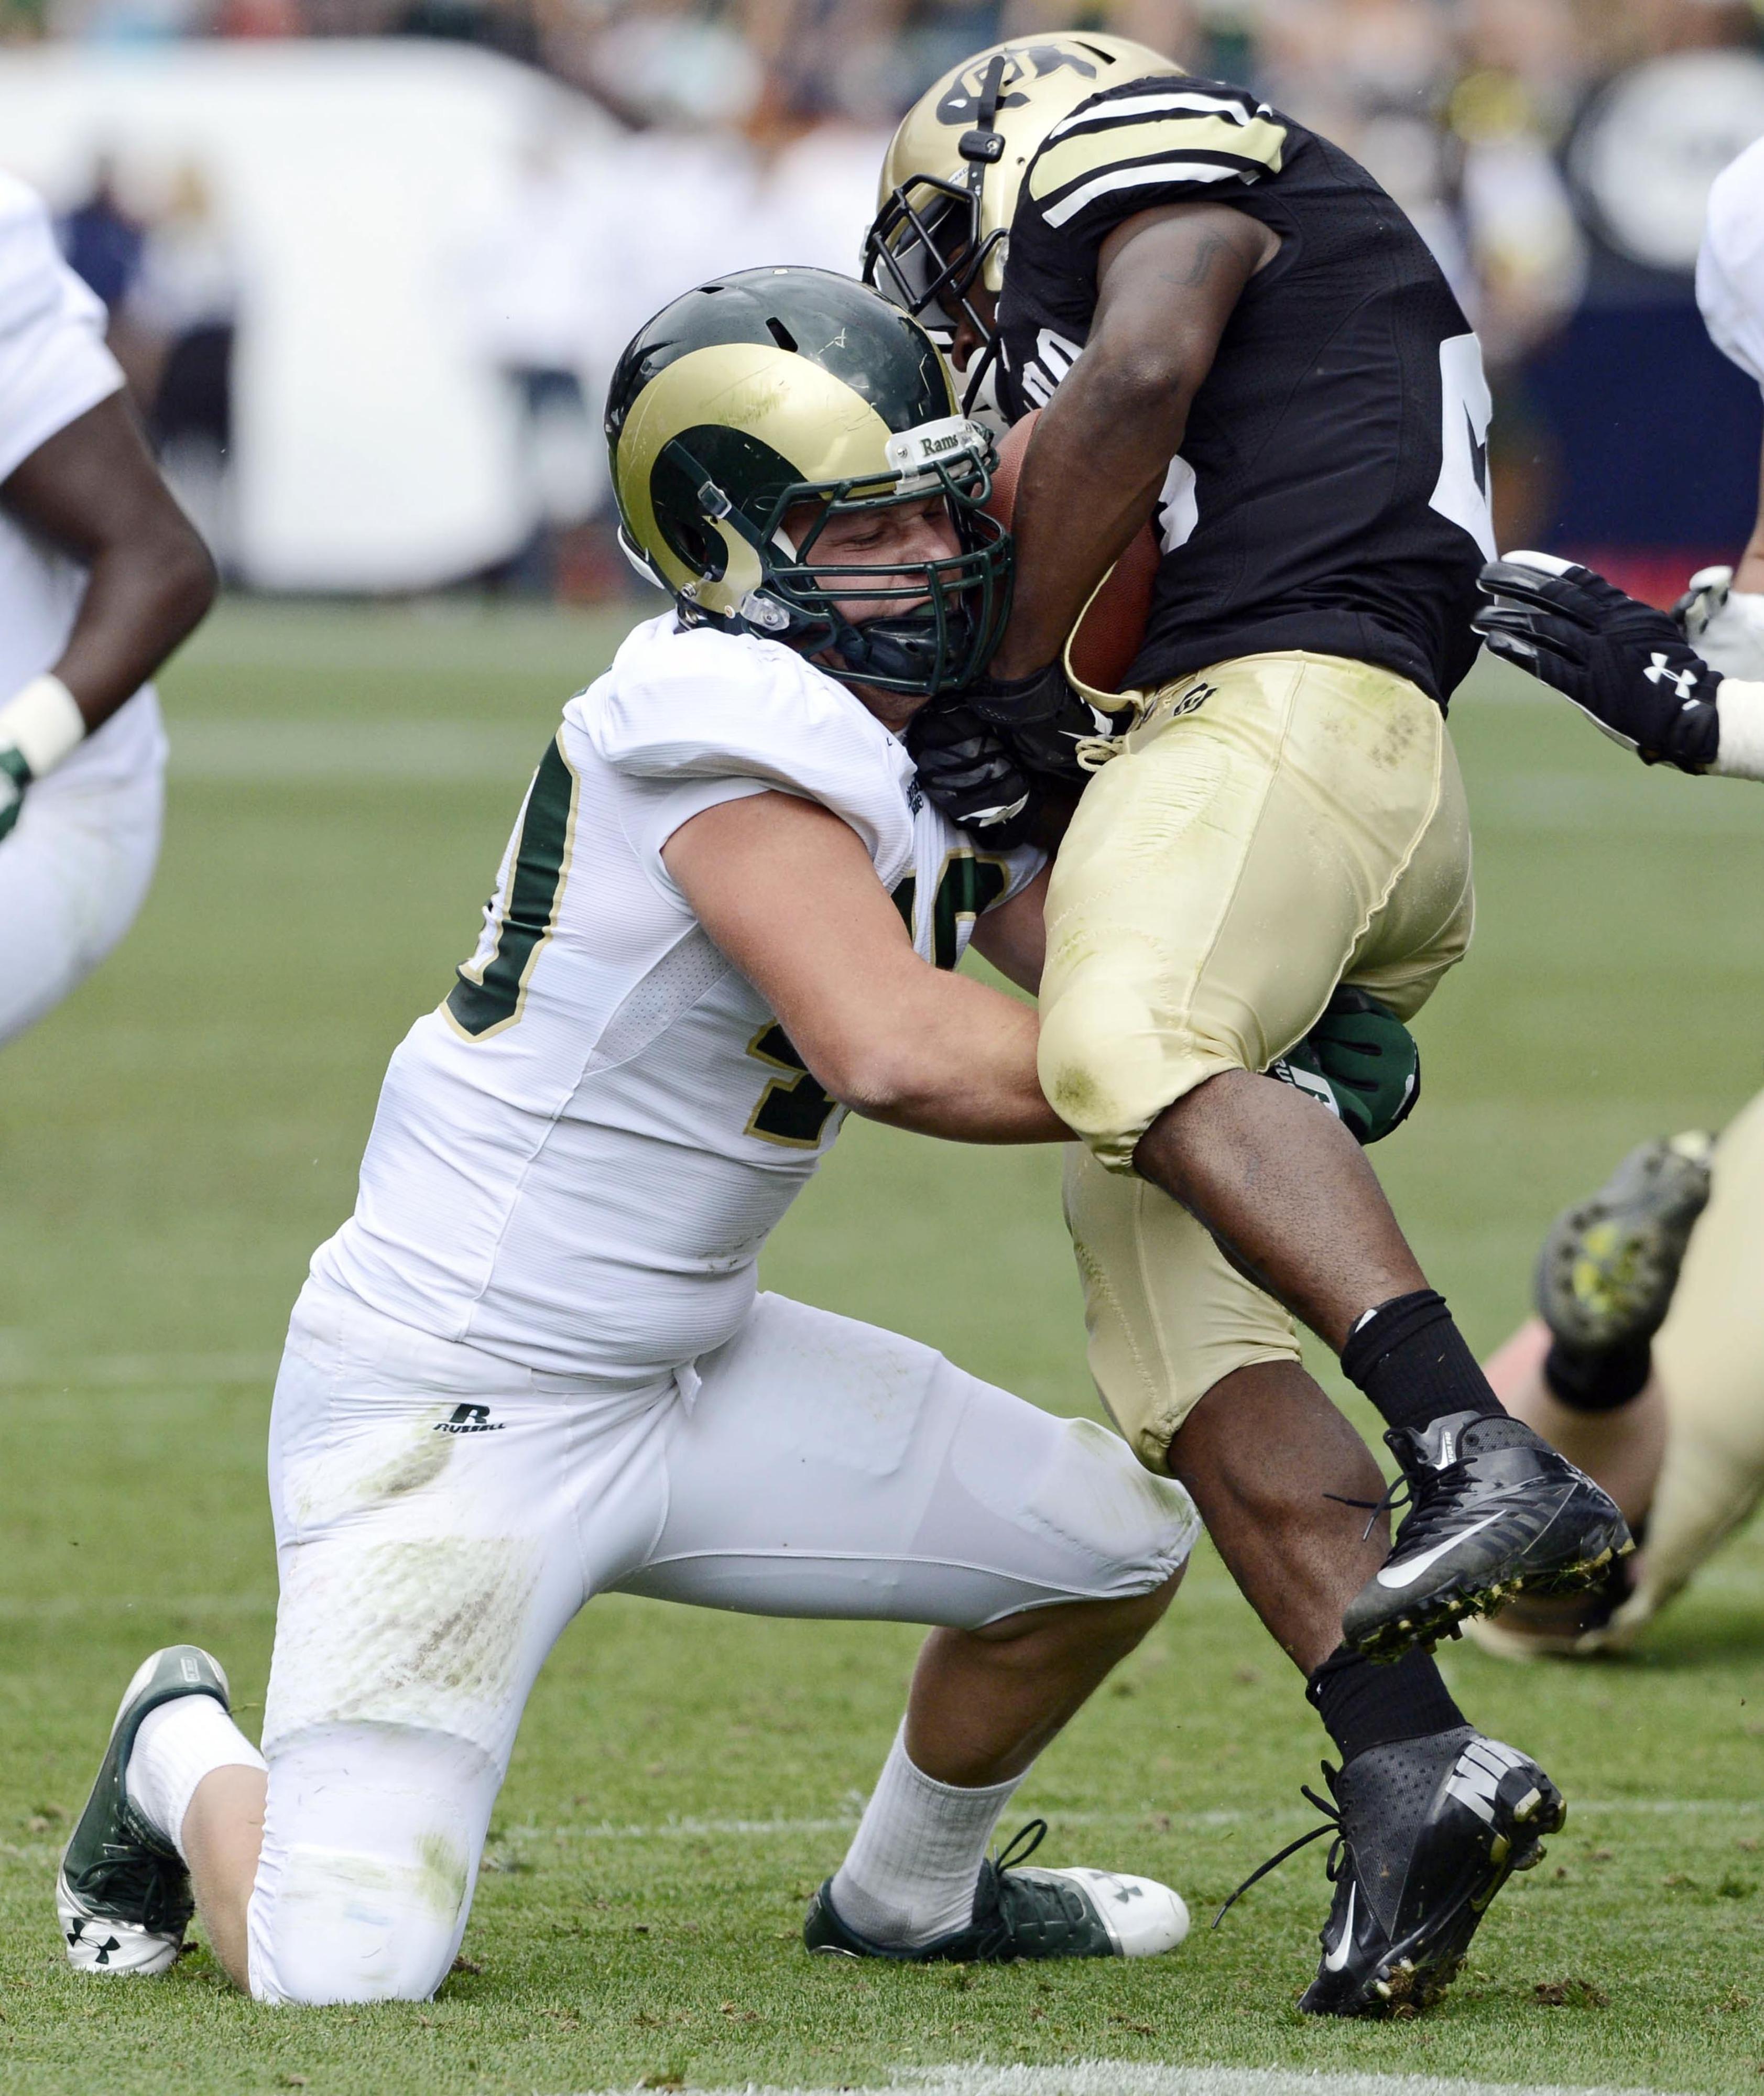 Linebacker Max Morgan is a stalwart for CSU.